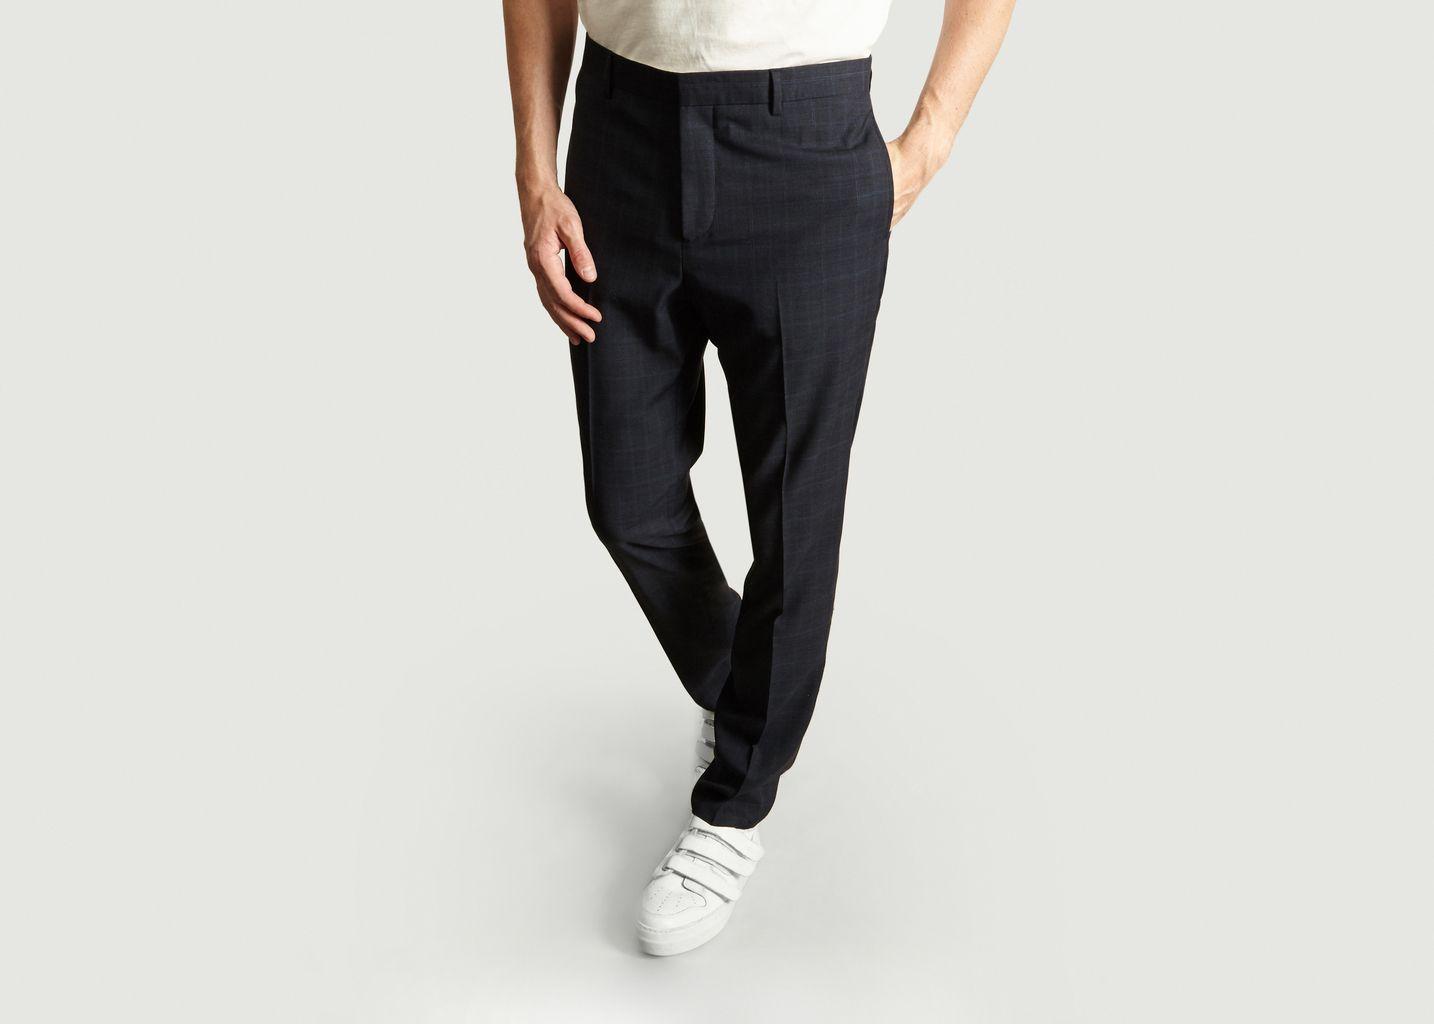 Pantalon Stephane - Archive 18-20